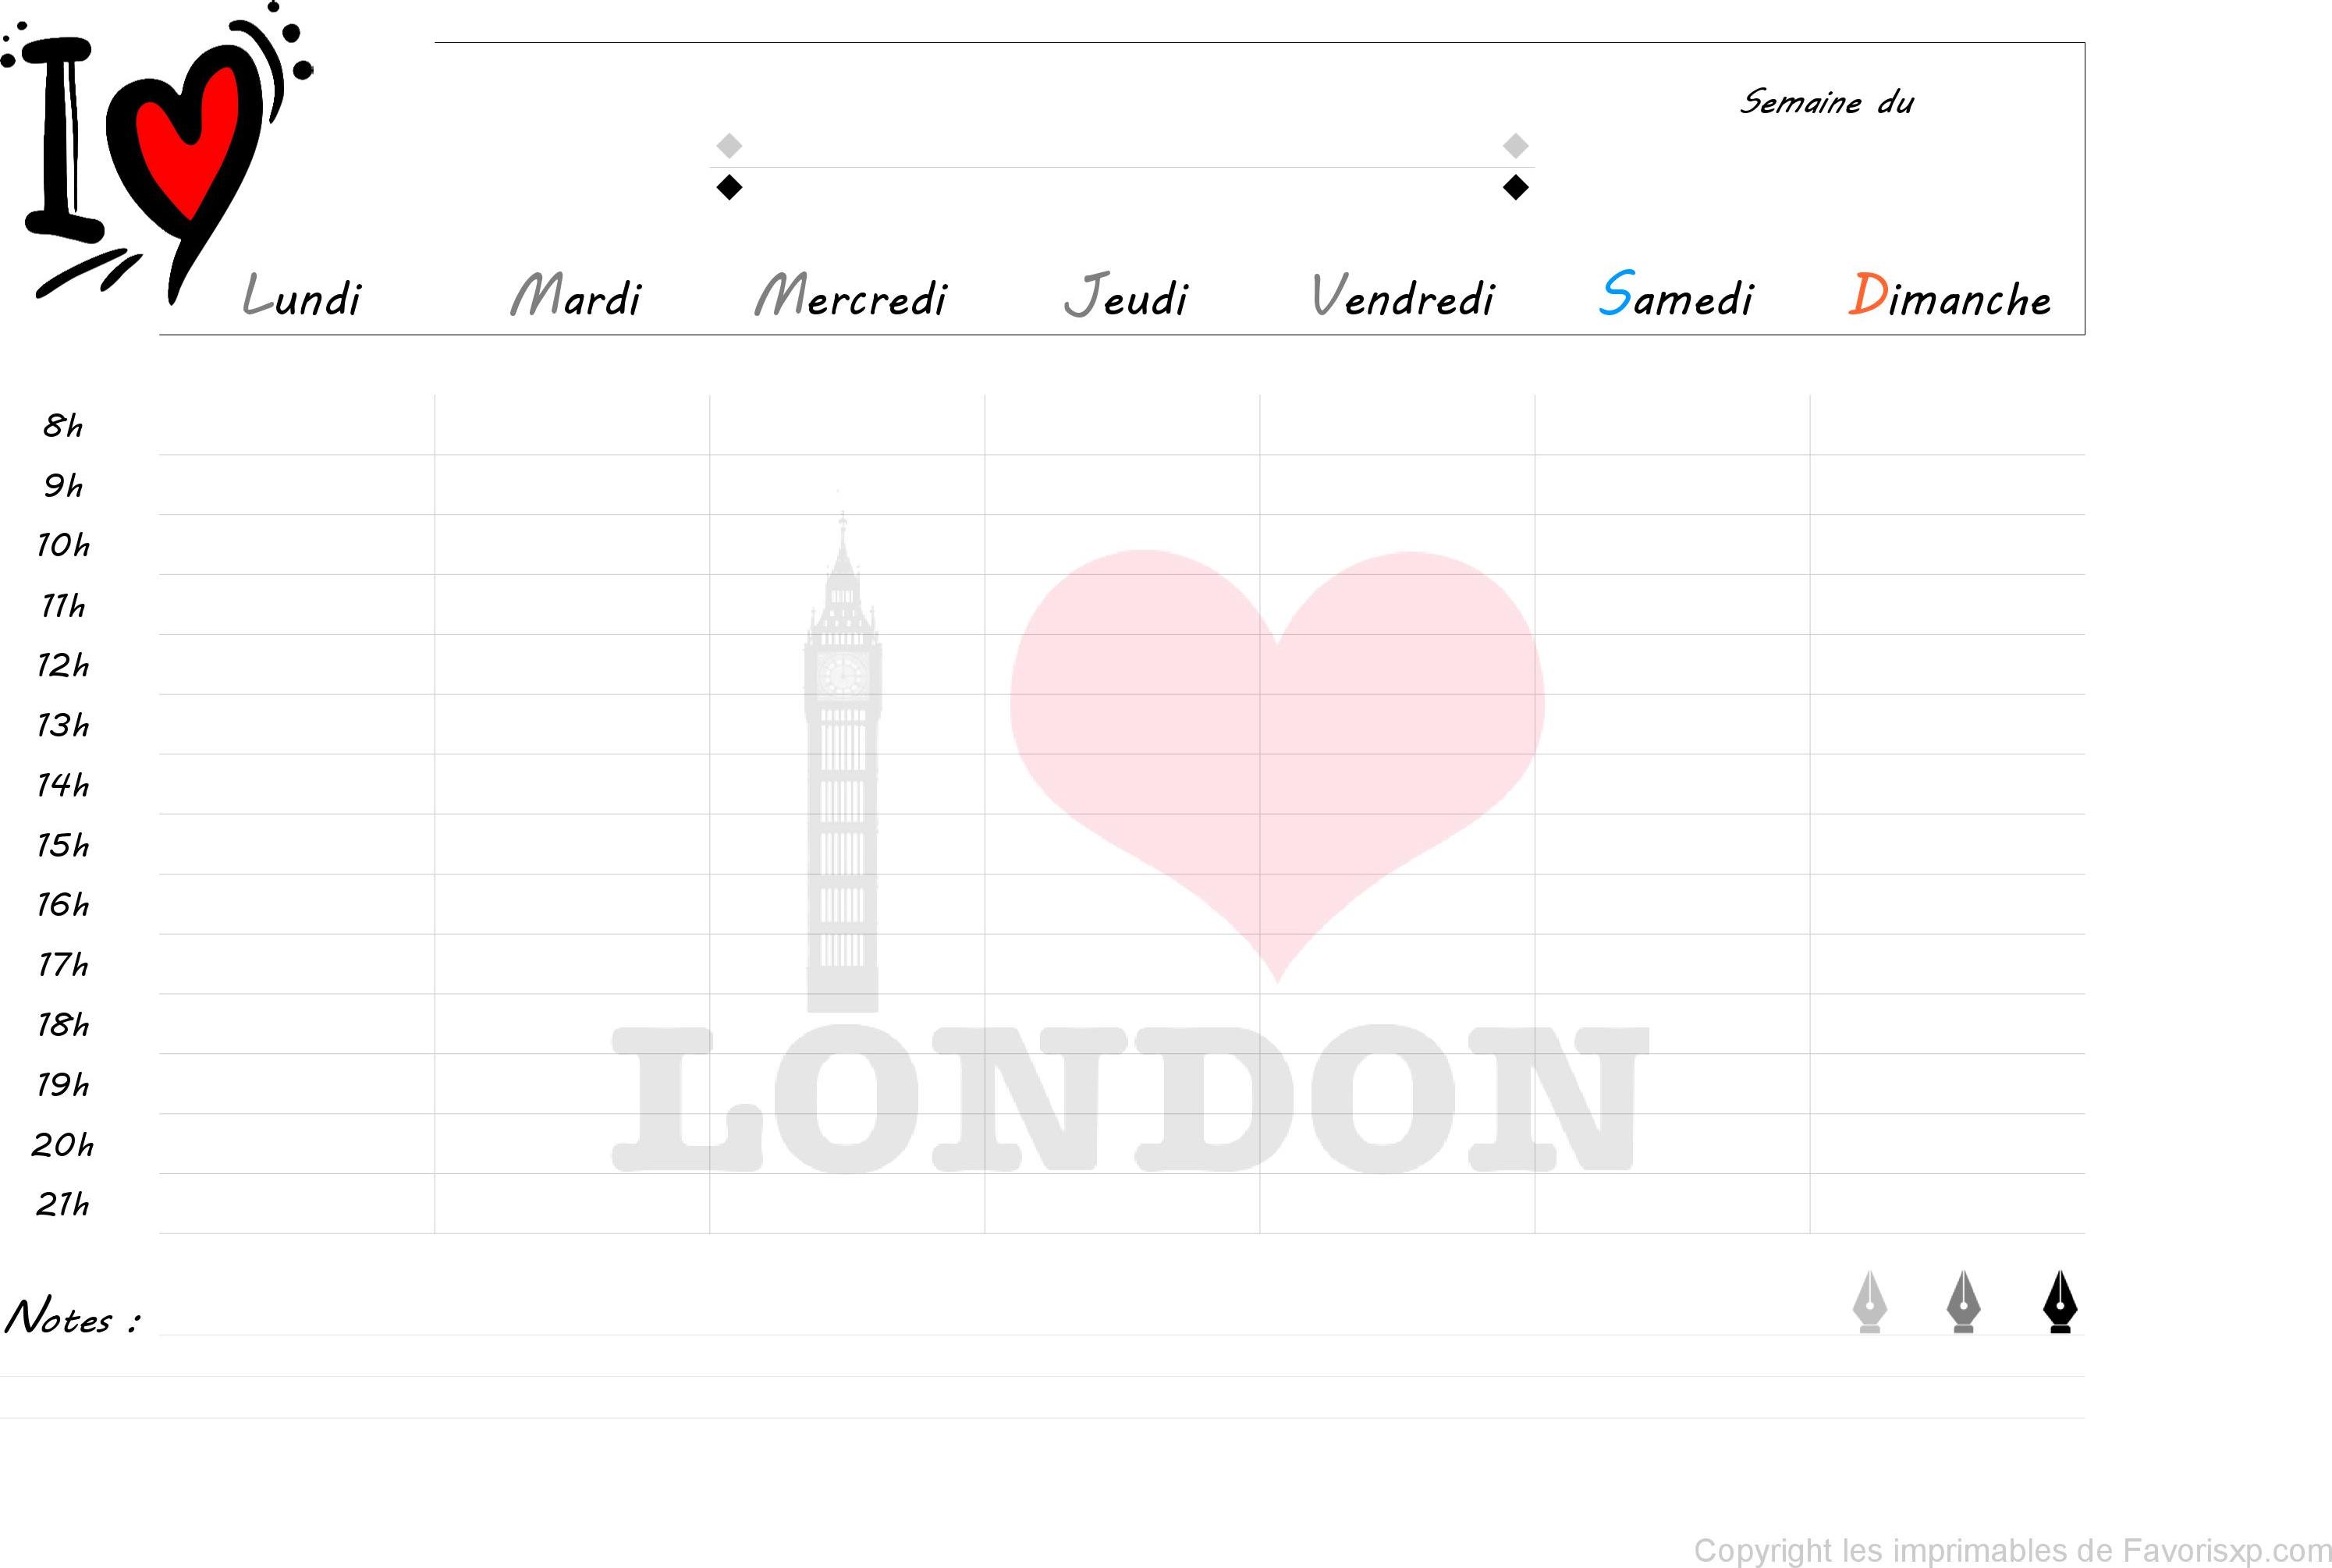 semainier imprimer planning de semaine avec heures i love london organisation semaine. Black Bedroom Furniture Sets. Home Design Ideas